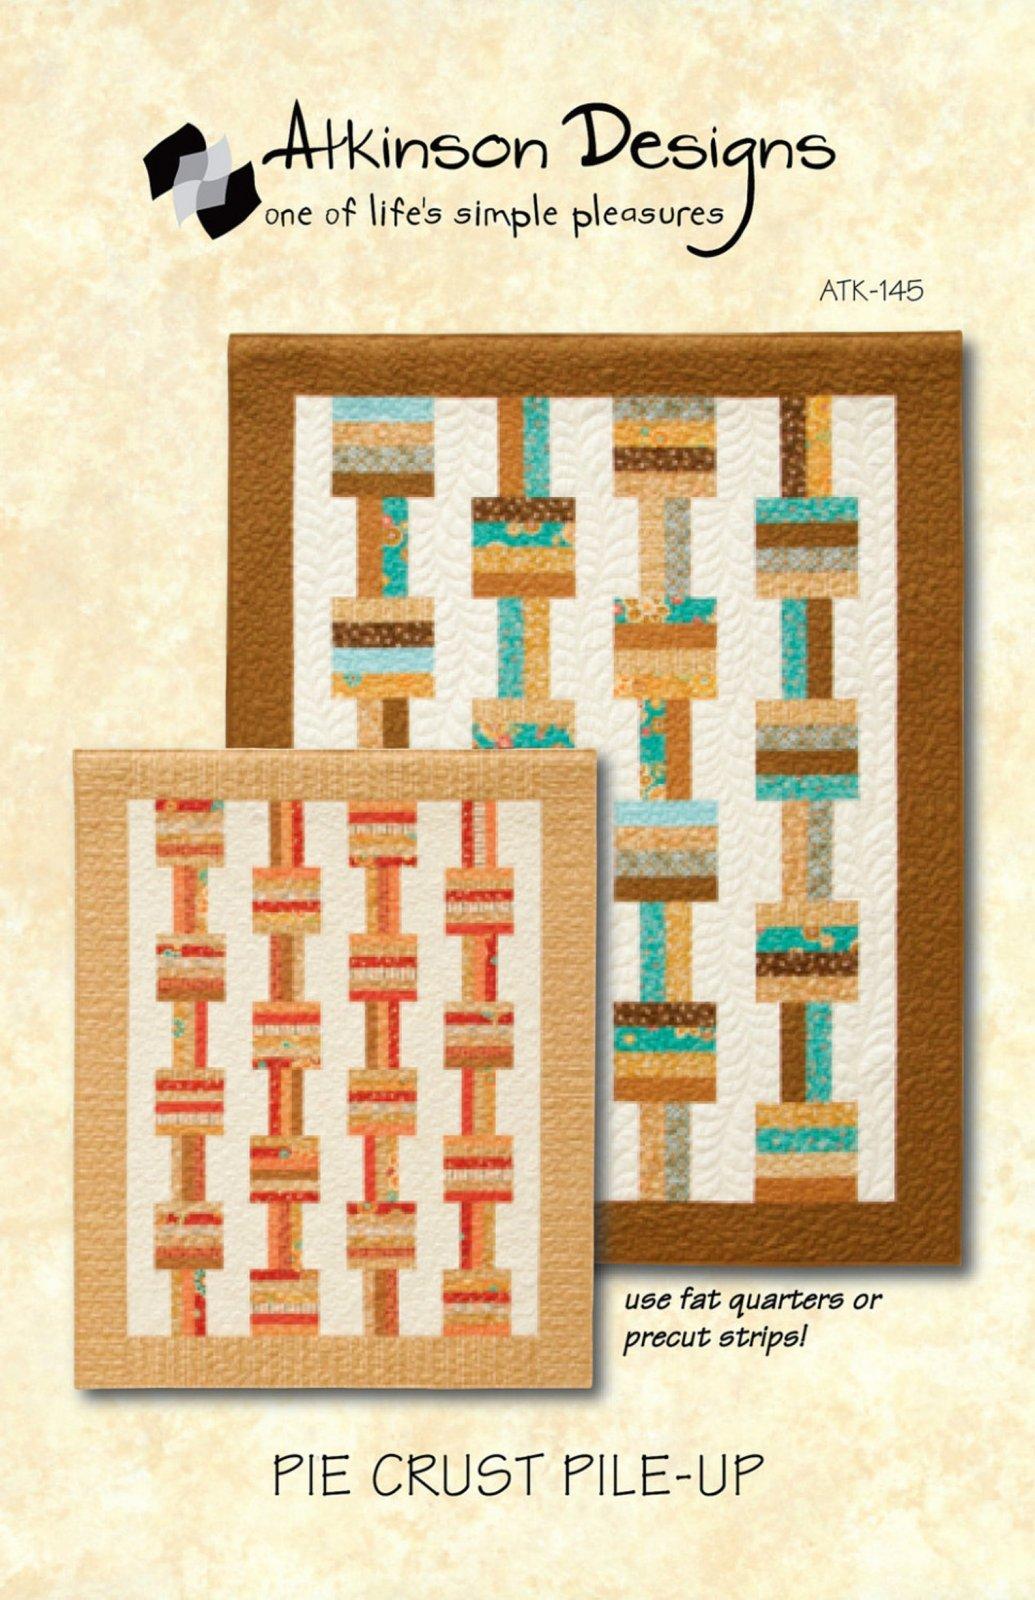 Atkinson Designs- Pie Crust Pile - Up